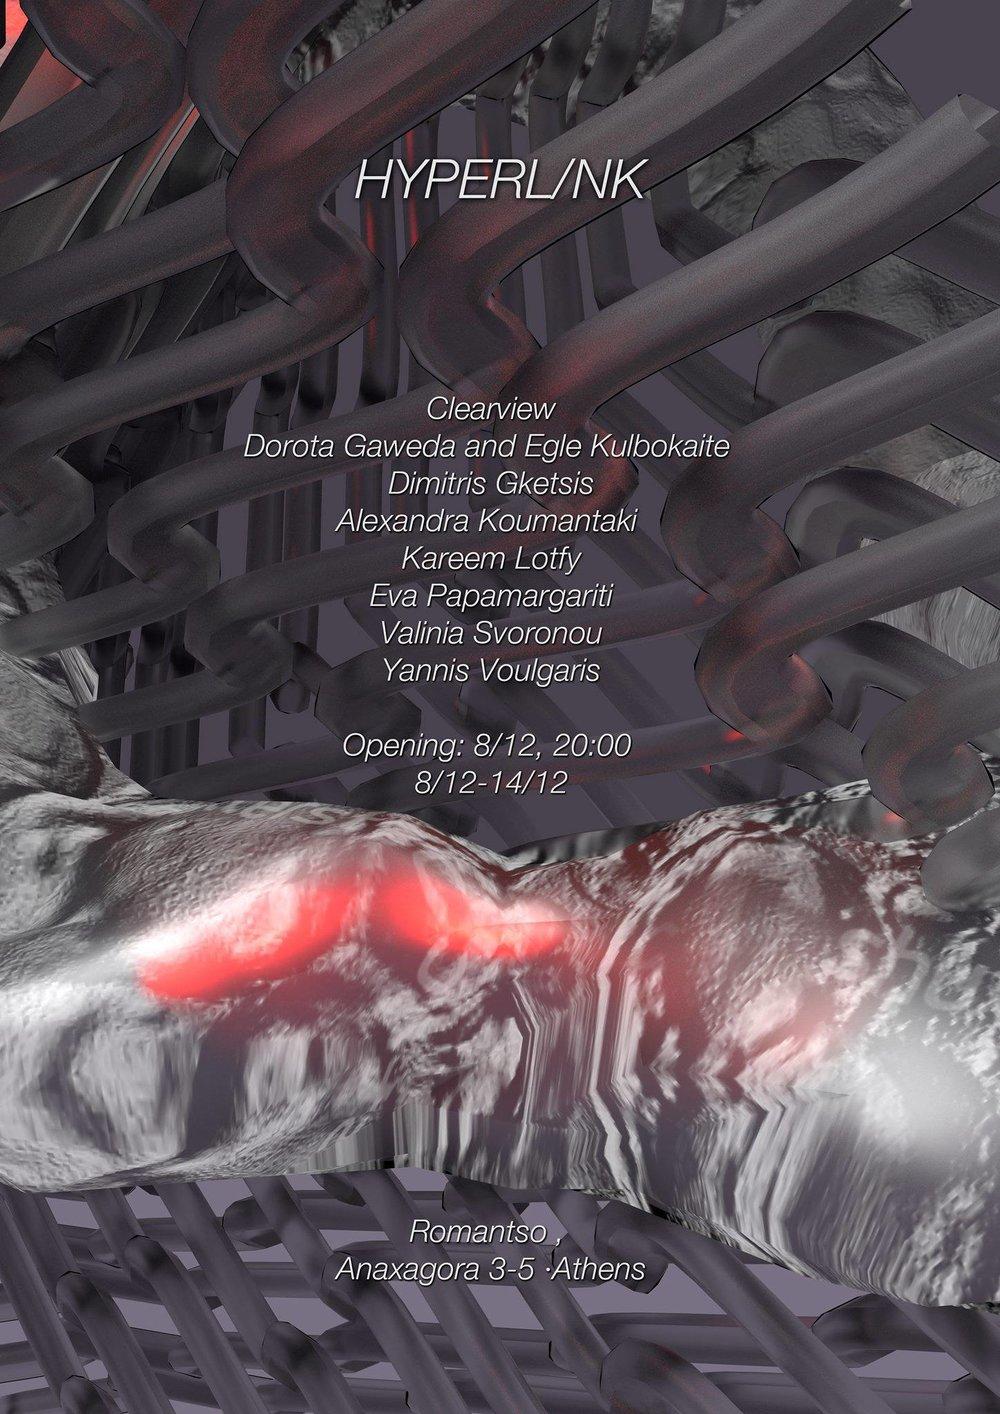 'Hyperlink'clearview, Dorota Gaweda & Egle Kulbokaite, Dimitris Gketsis, Alexandra Koumantaki, Kareem Lotfy, Eva Papamargariti, Valinia Svoronou, Yannis Voulgaris(08/12/17 - 14/12/17)@ Romantso, Athens(Facebook Event) -